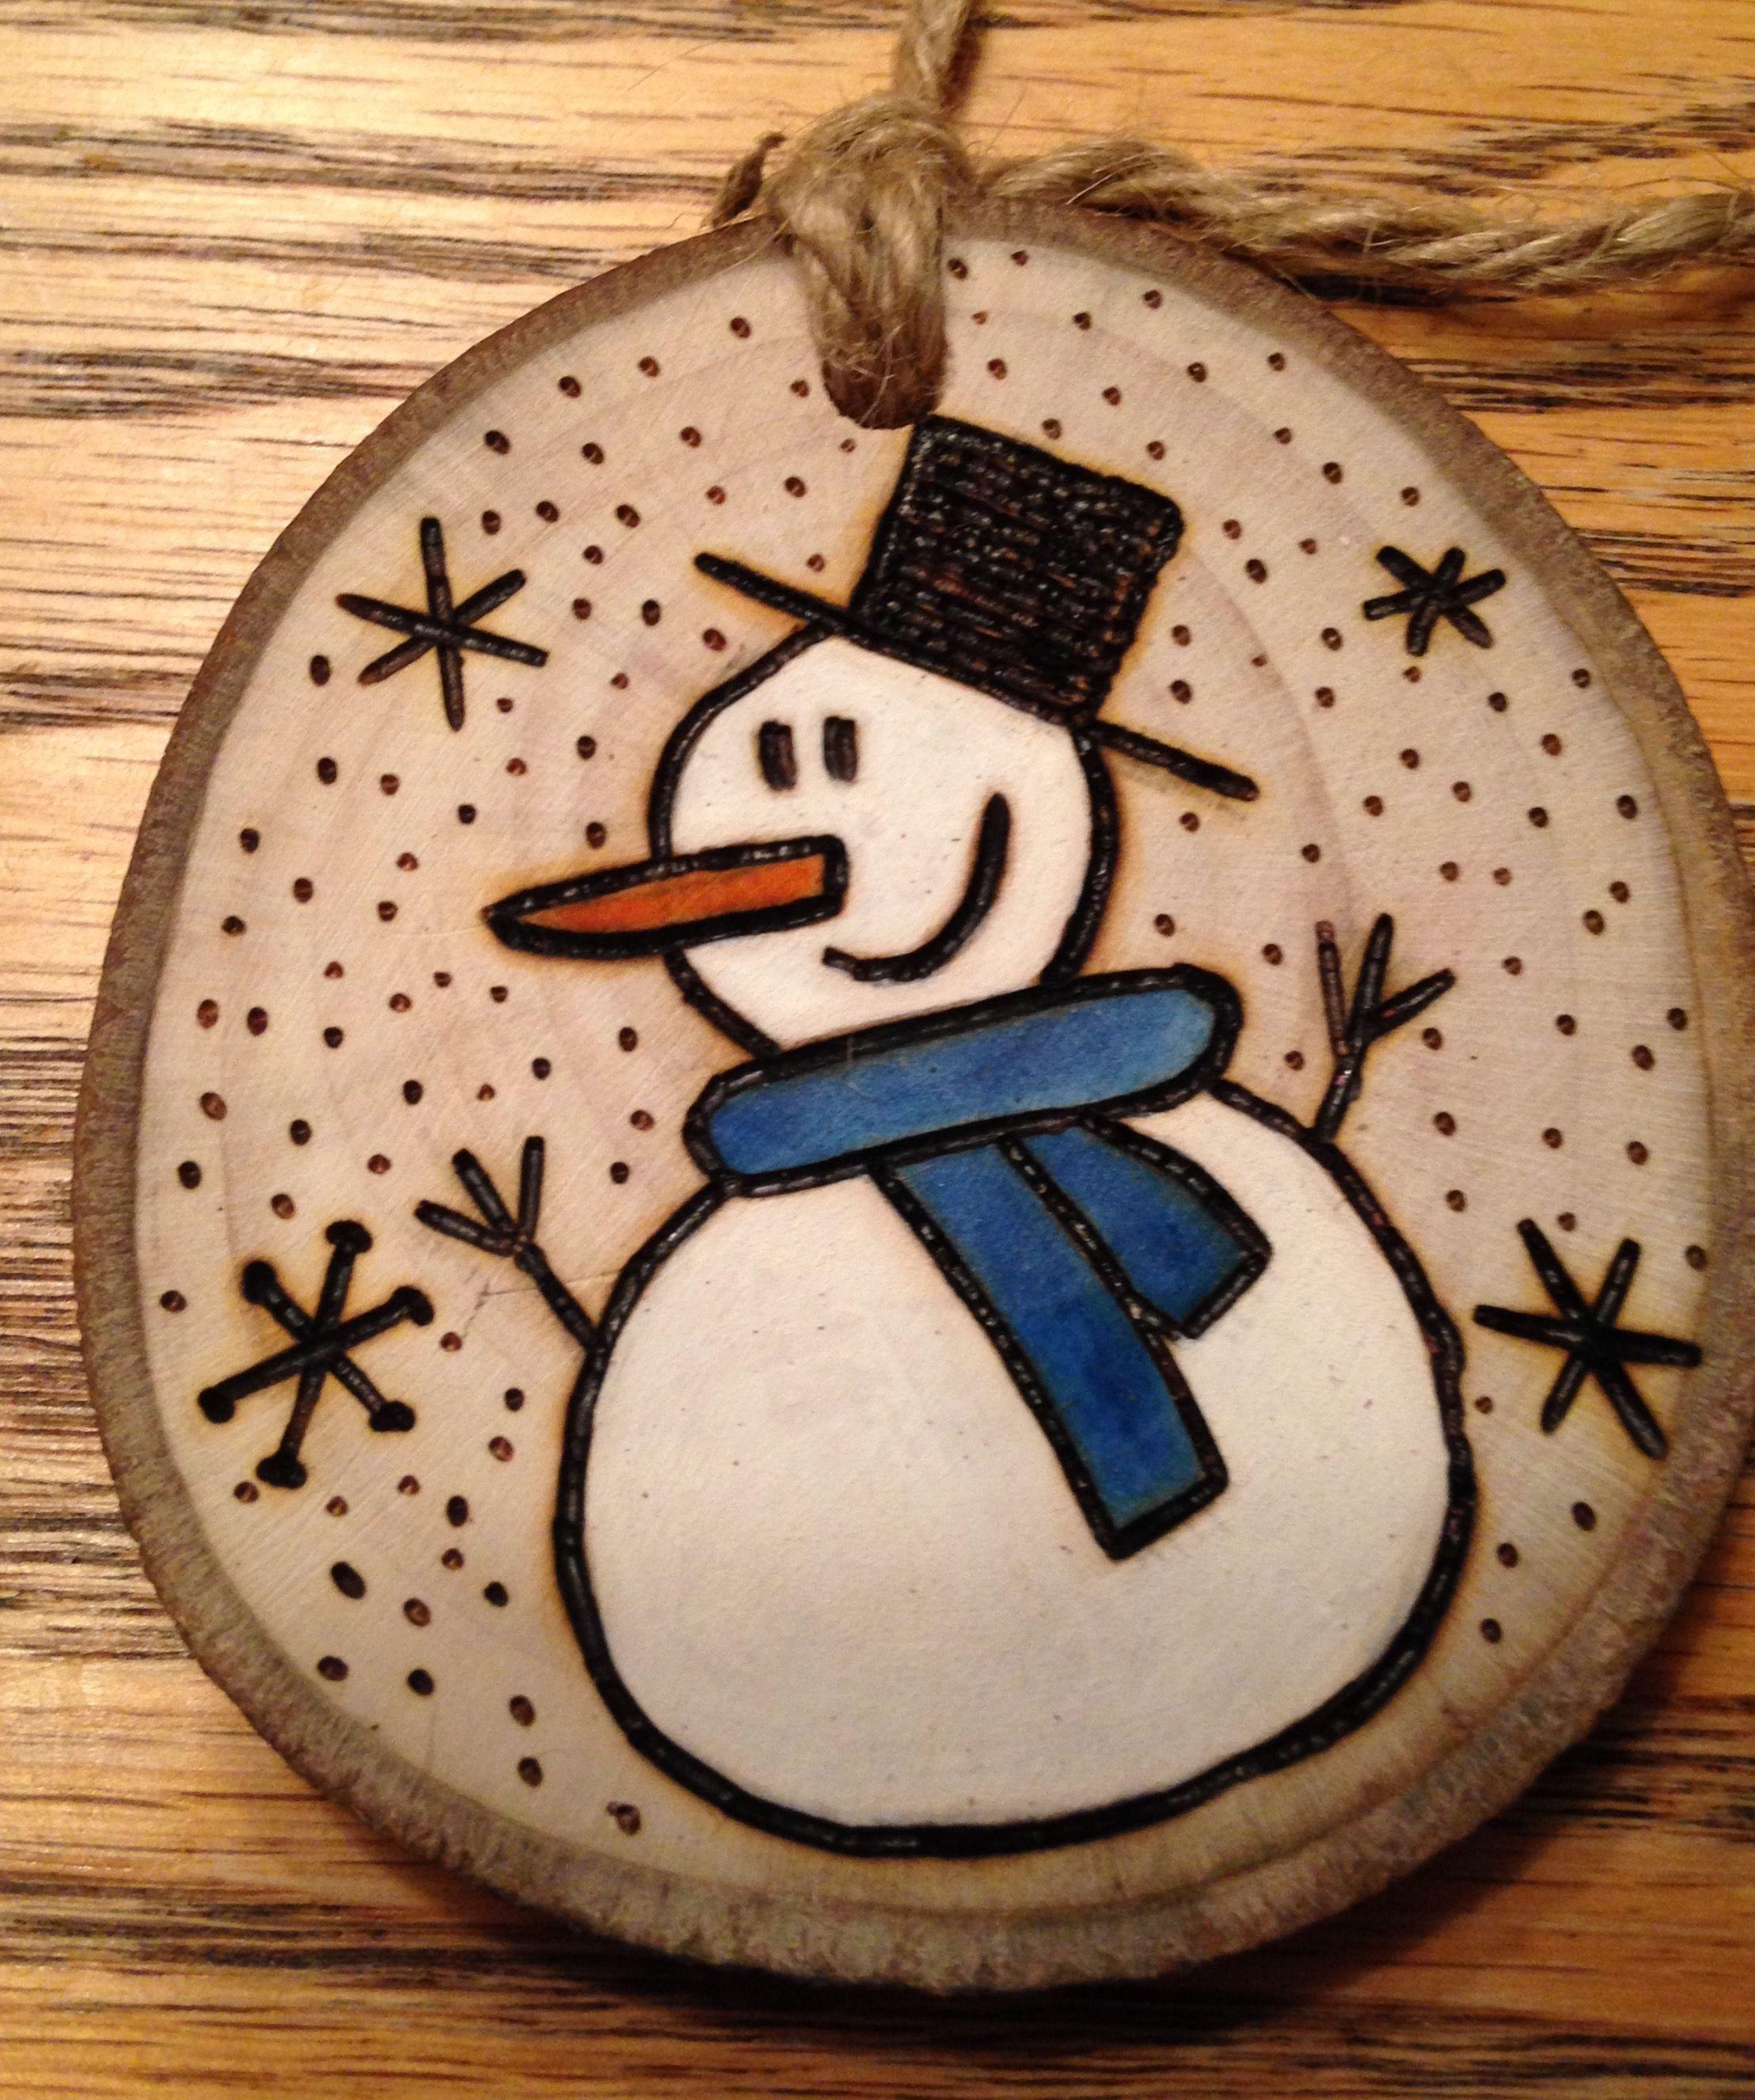 Rustic snowman wood burned Christmas ornament natural